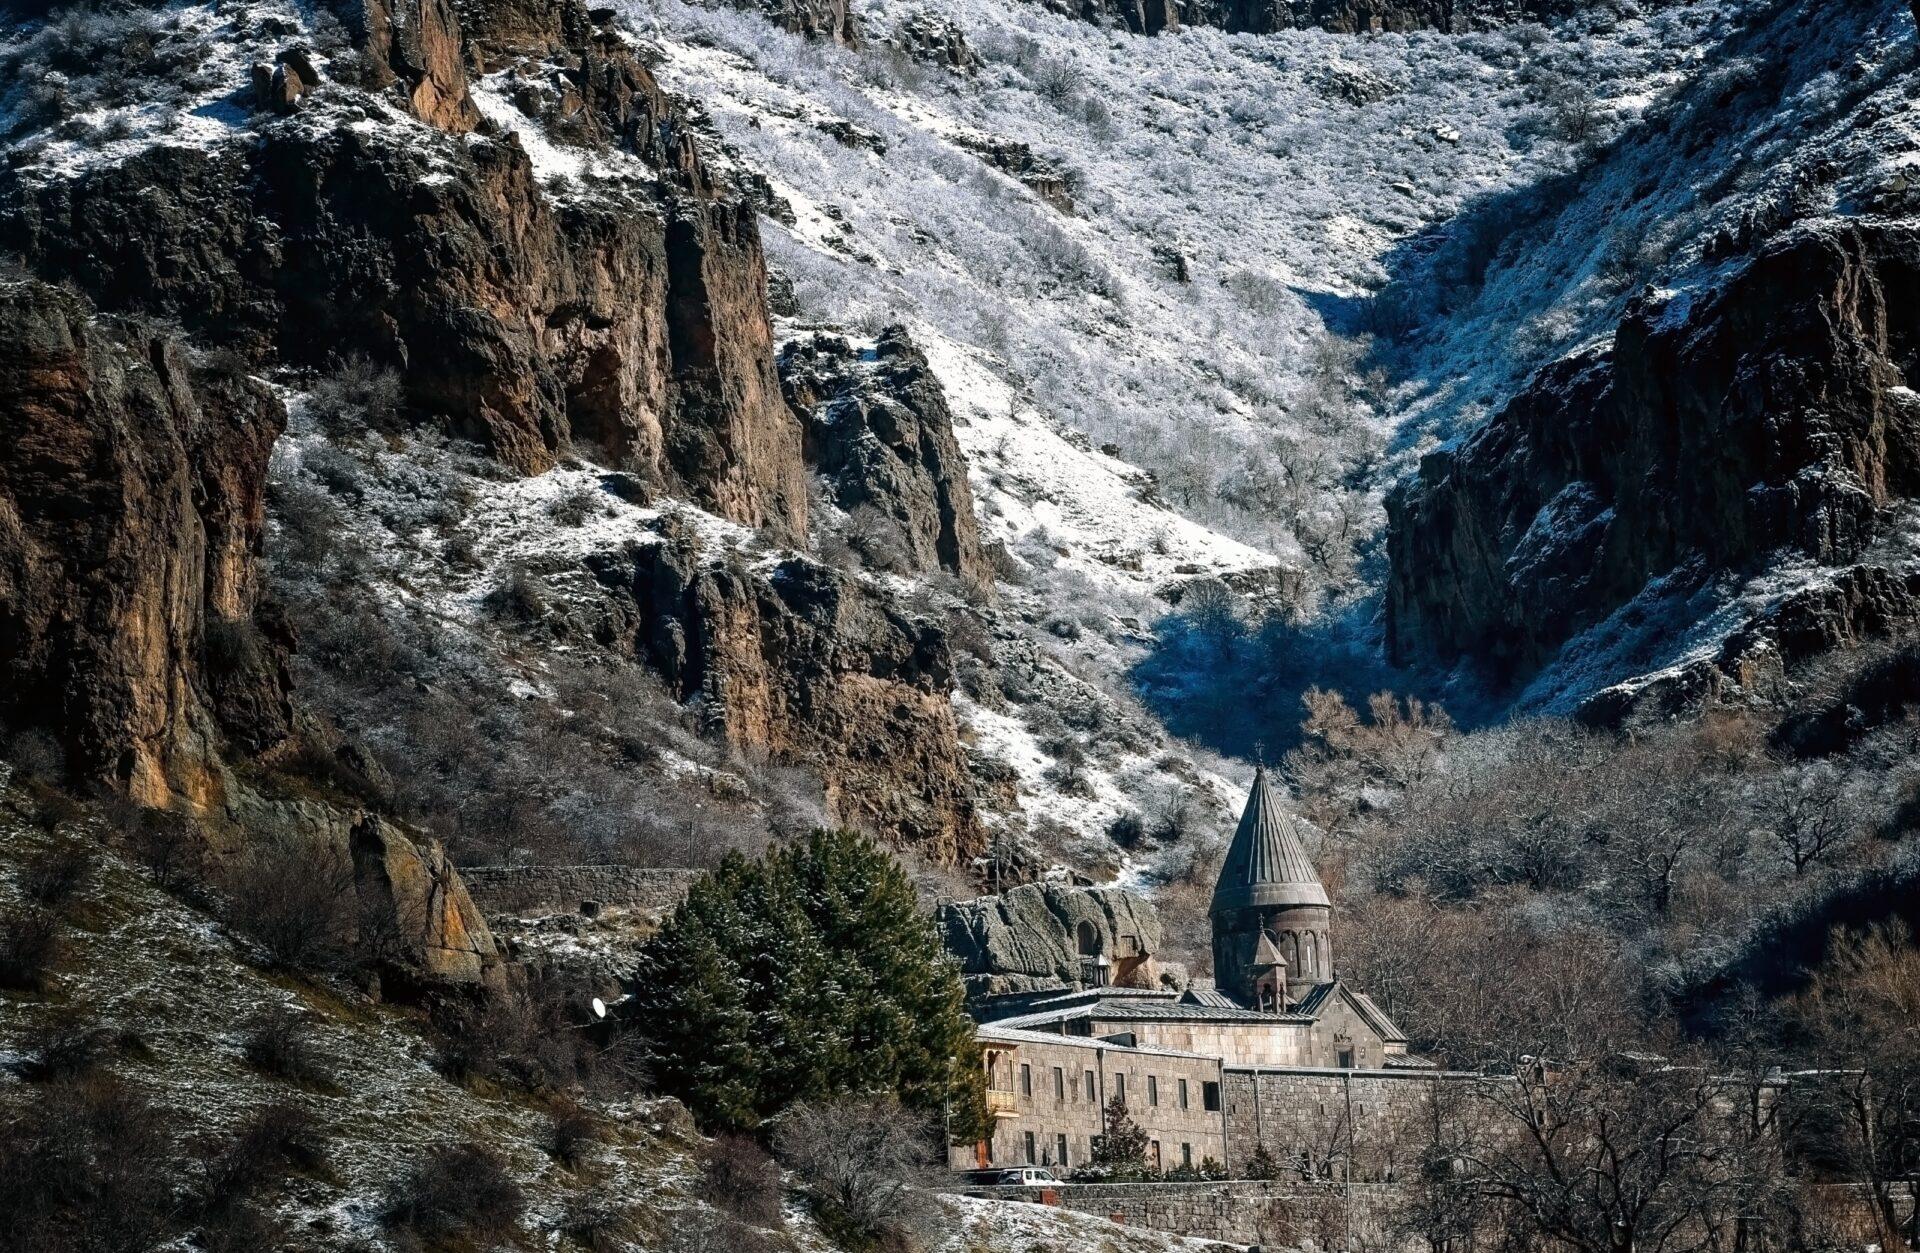 Монастырь Гегард иозеро Севан